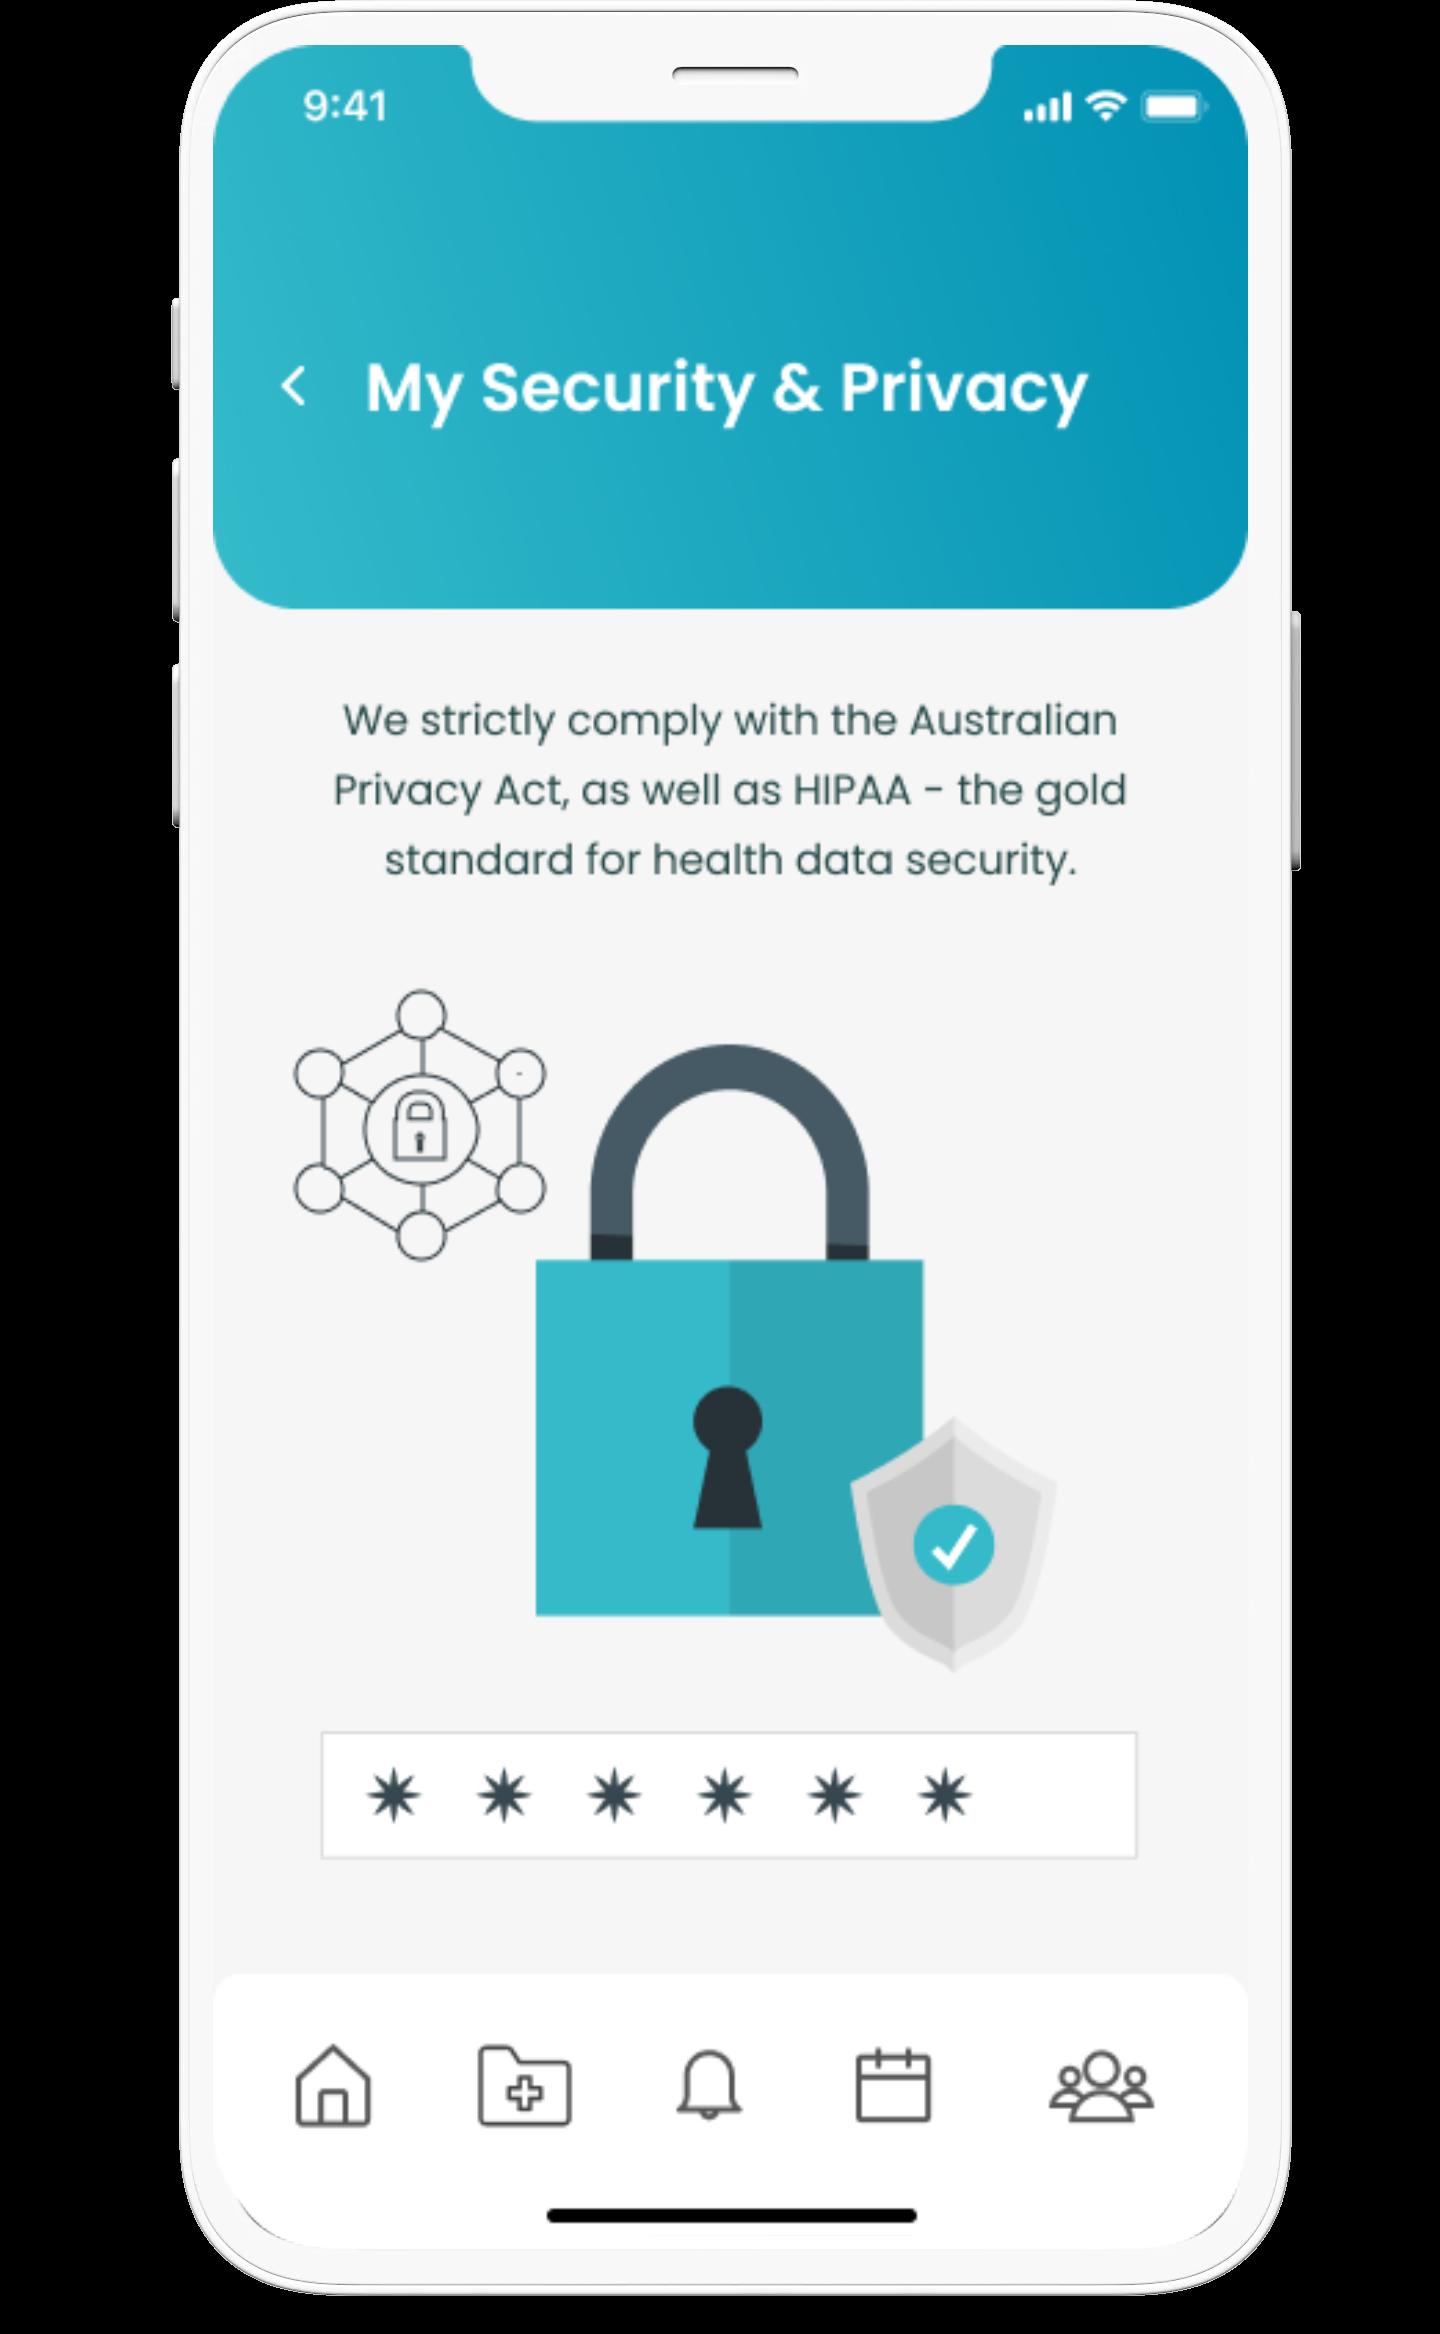 smartmockups_kllh6d46 security